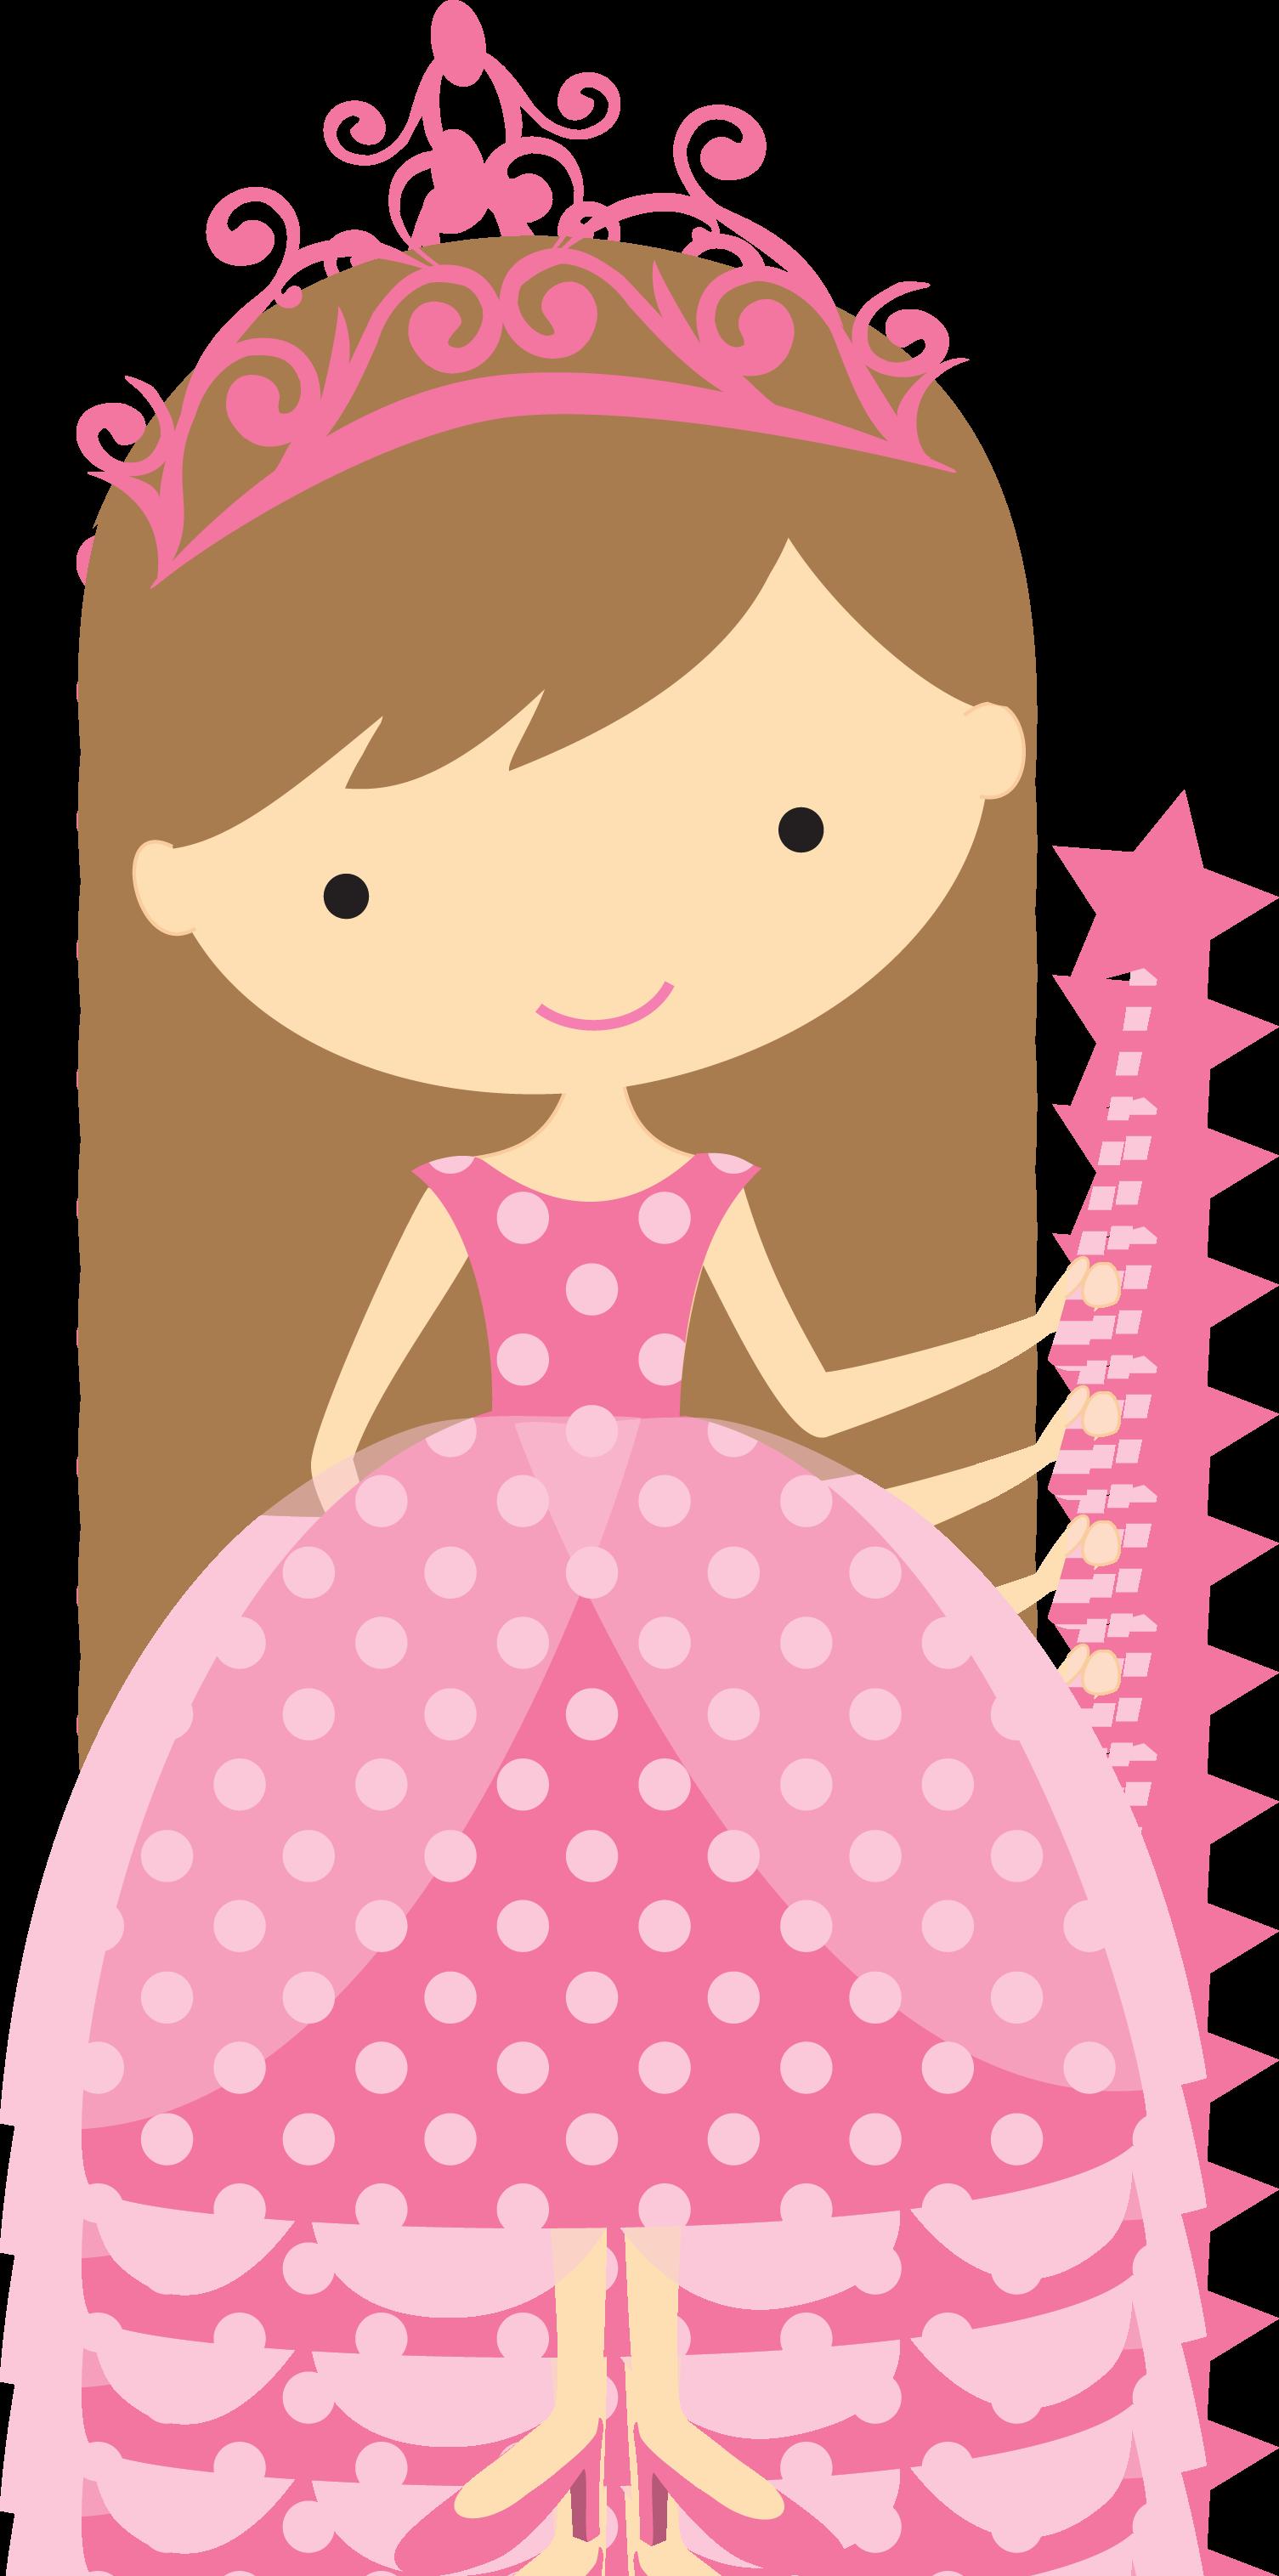 A new little princess clipart image little princess clip art - Google Search | princess/pirate templates ... image